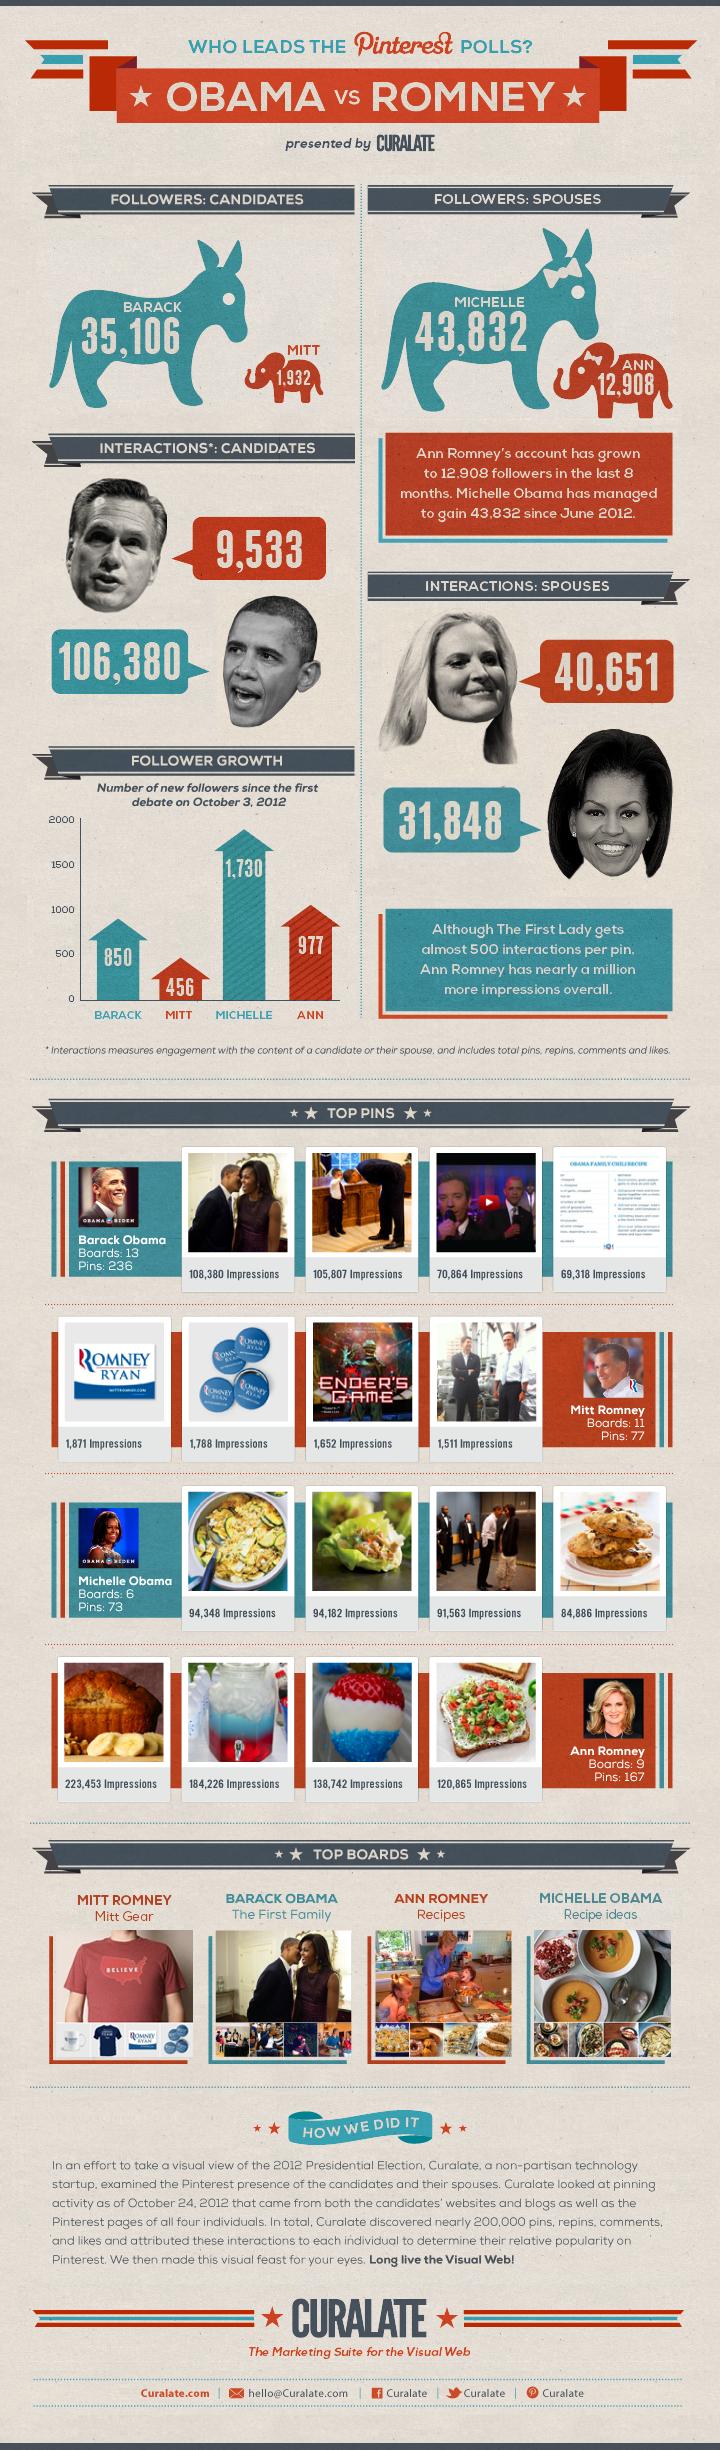 Obama vs Romney en Pinterest #infografia #infographic #socialmedia